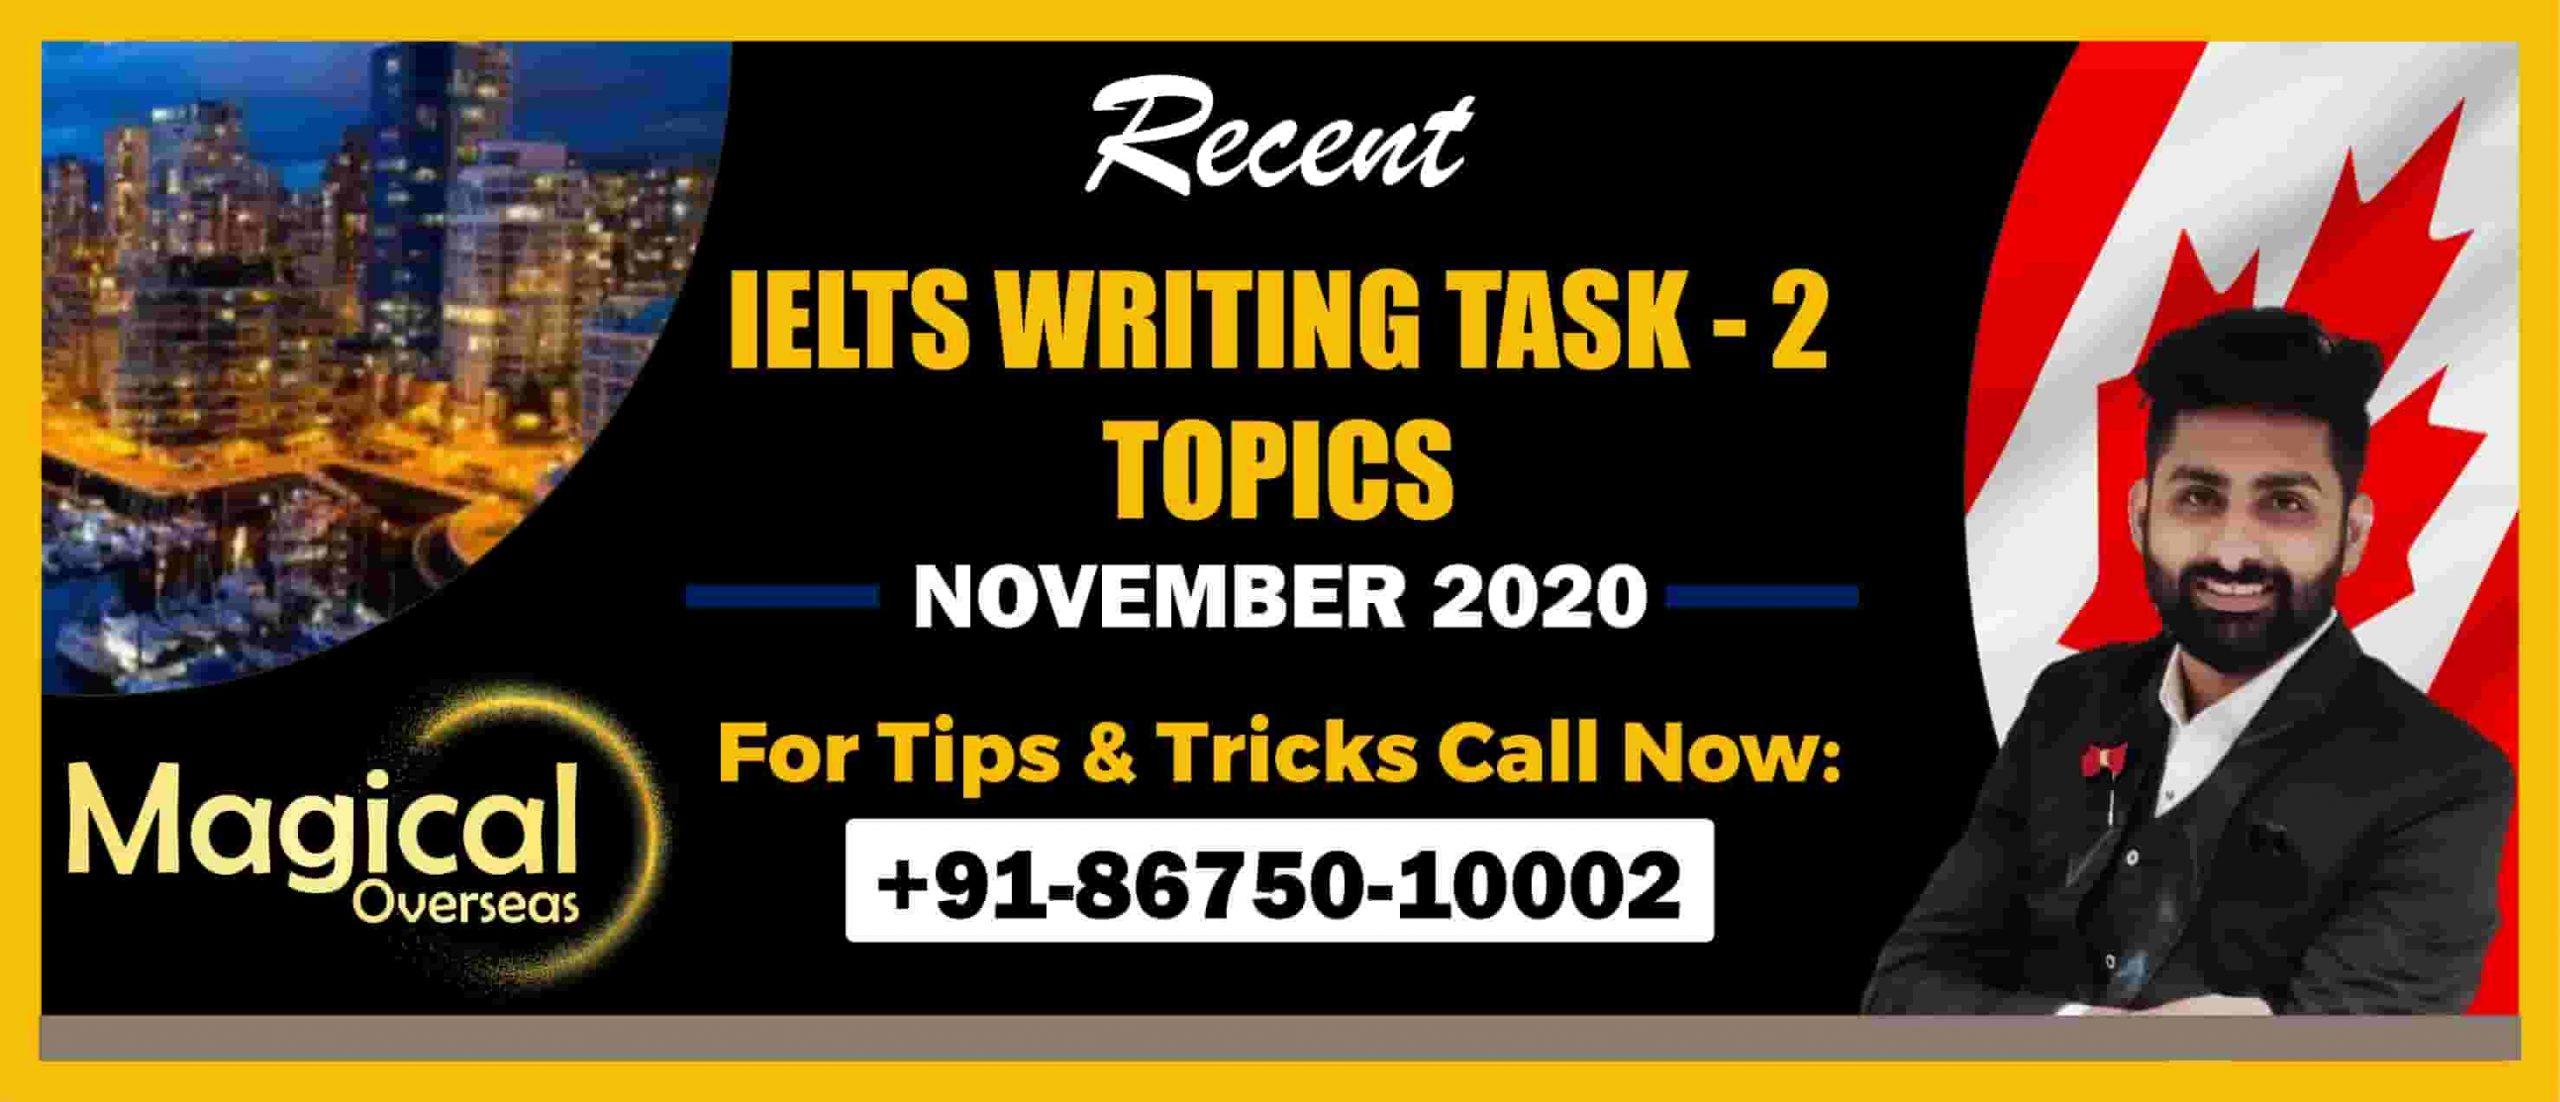 Writing Task 2 Topics Novermeber 2020-min (2)